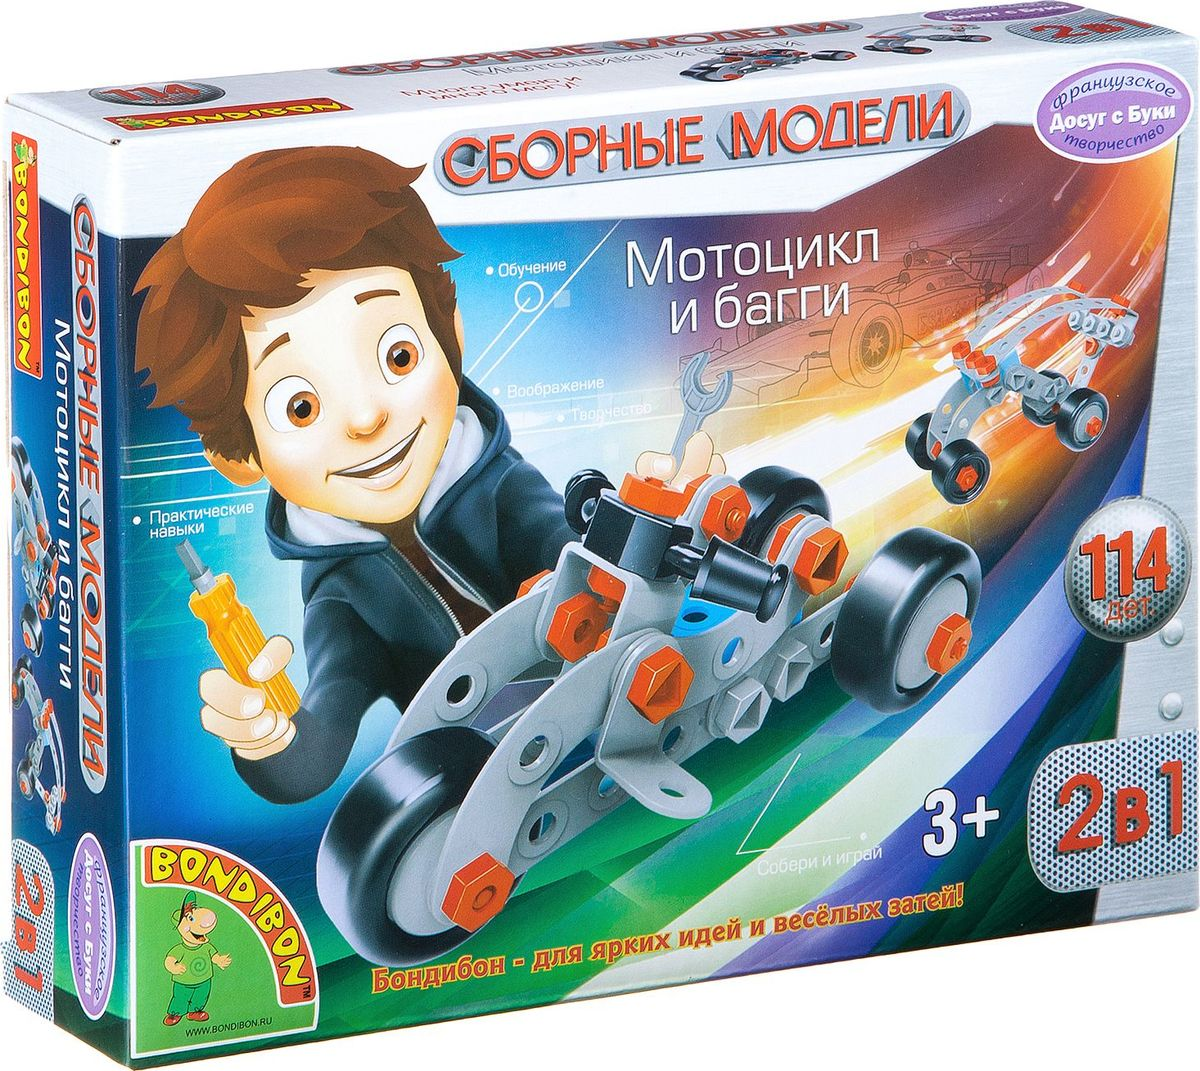 Bondibon Конструктор Мотоцикл и багги 2 в 1 intellect block конструктор багги 2 в 1